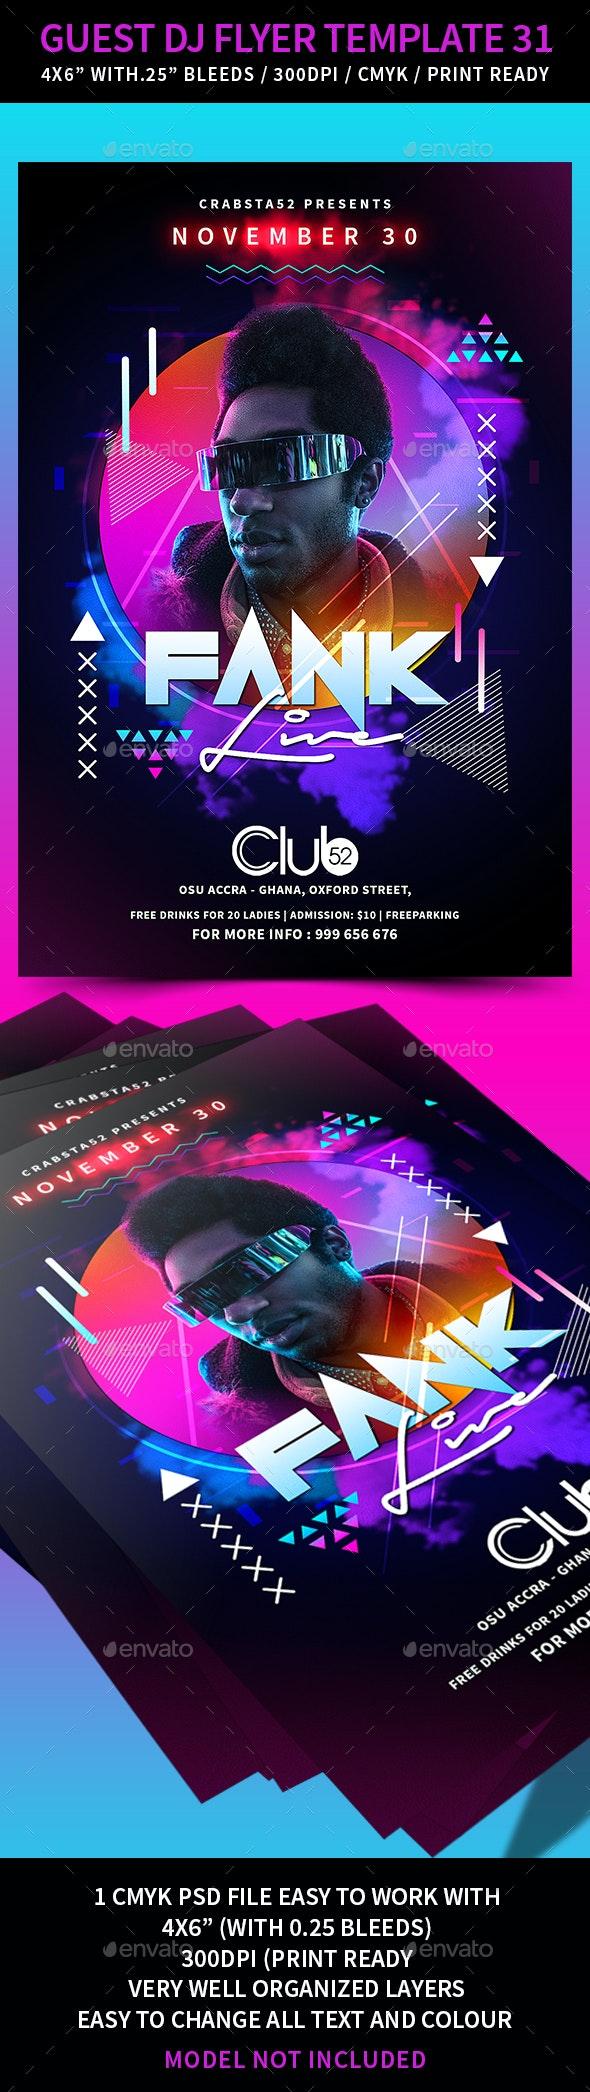 Guest DJ Flyer Template 31 - Flyers Print Templates